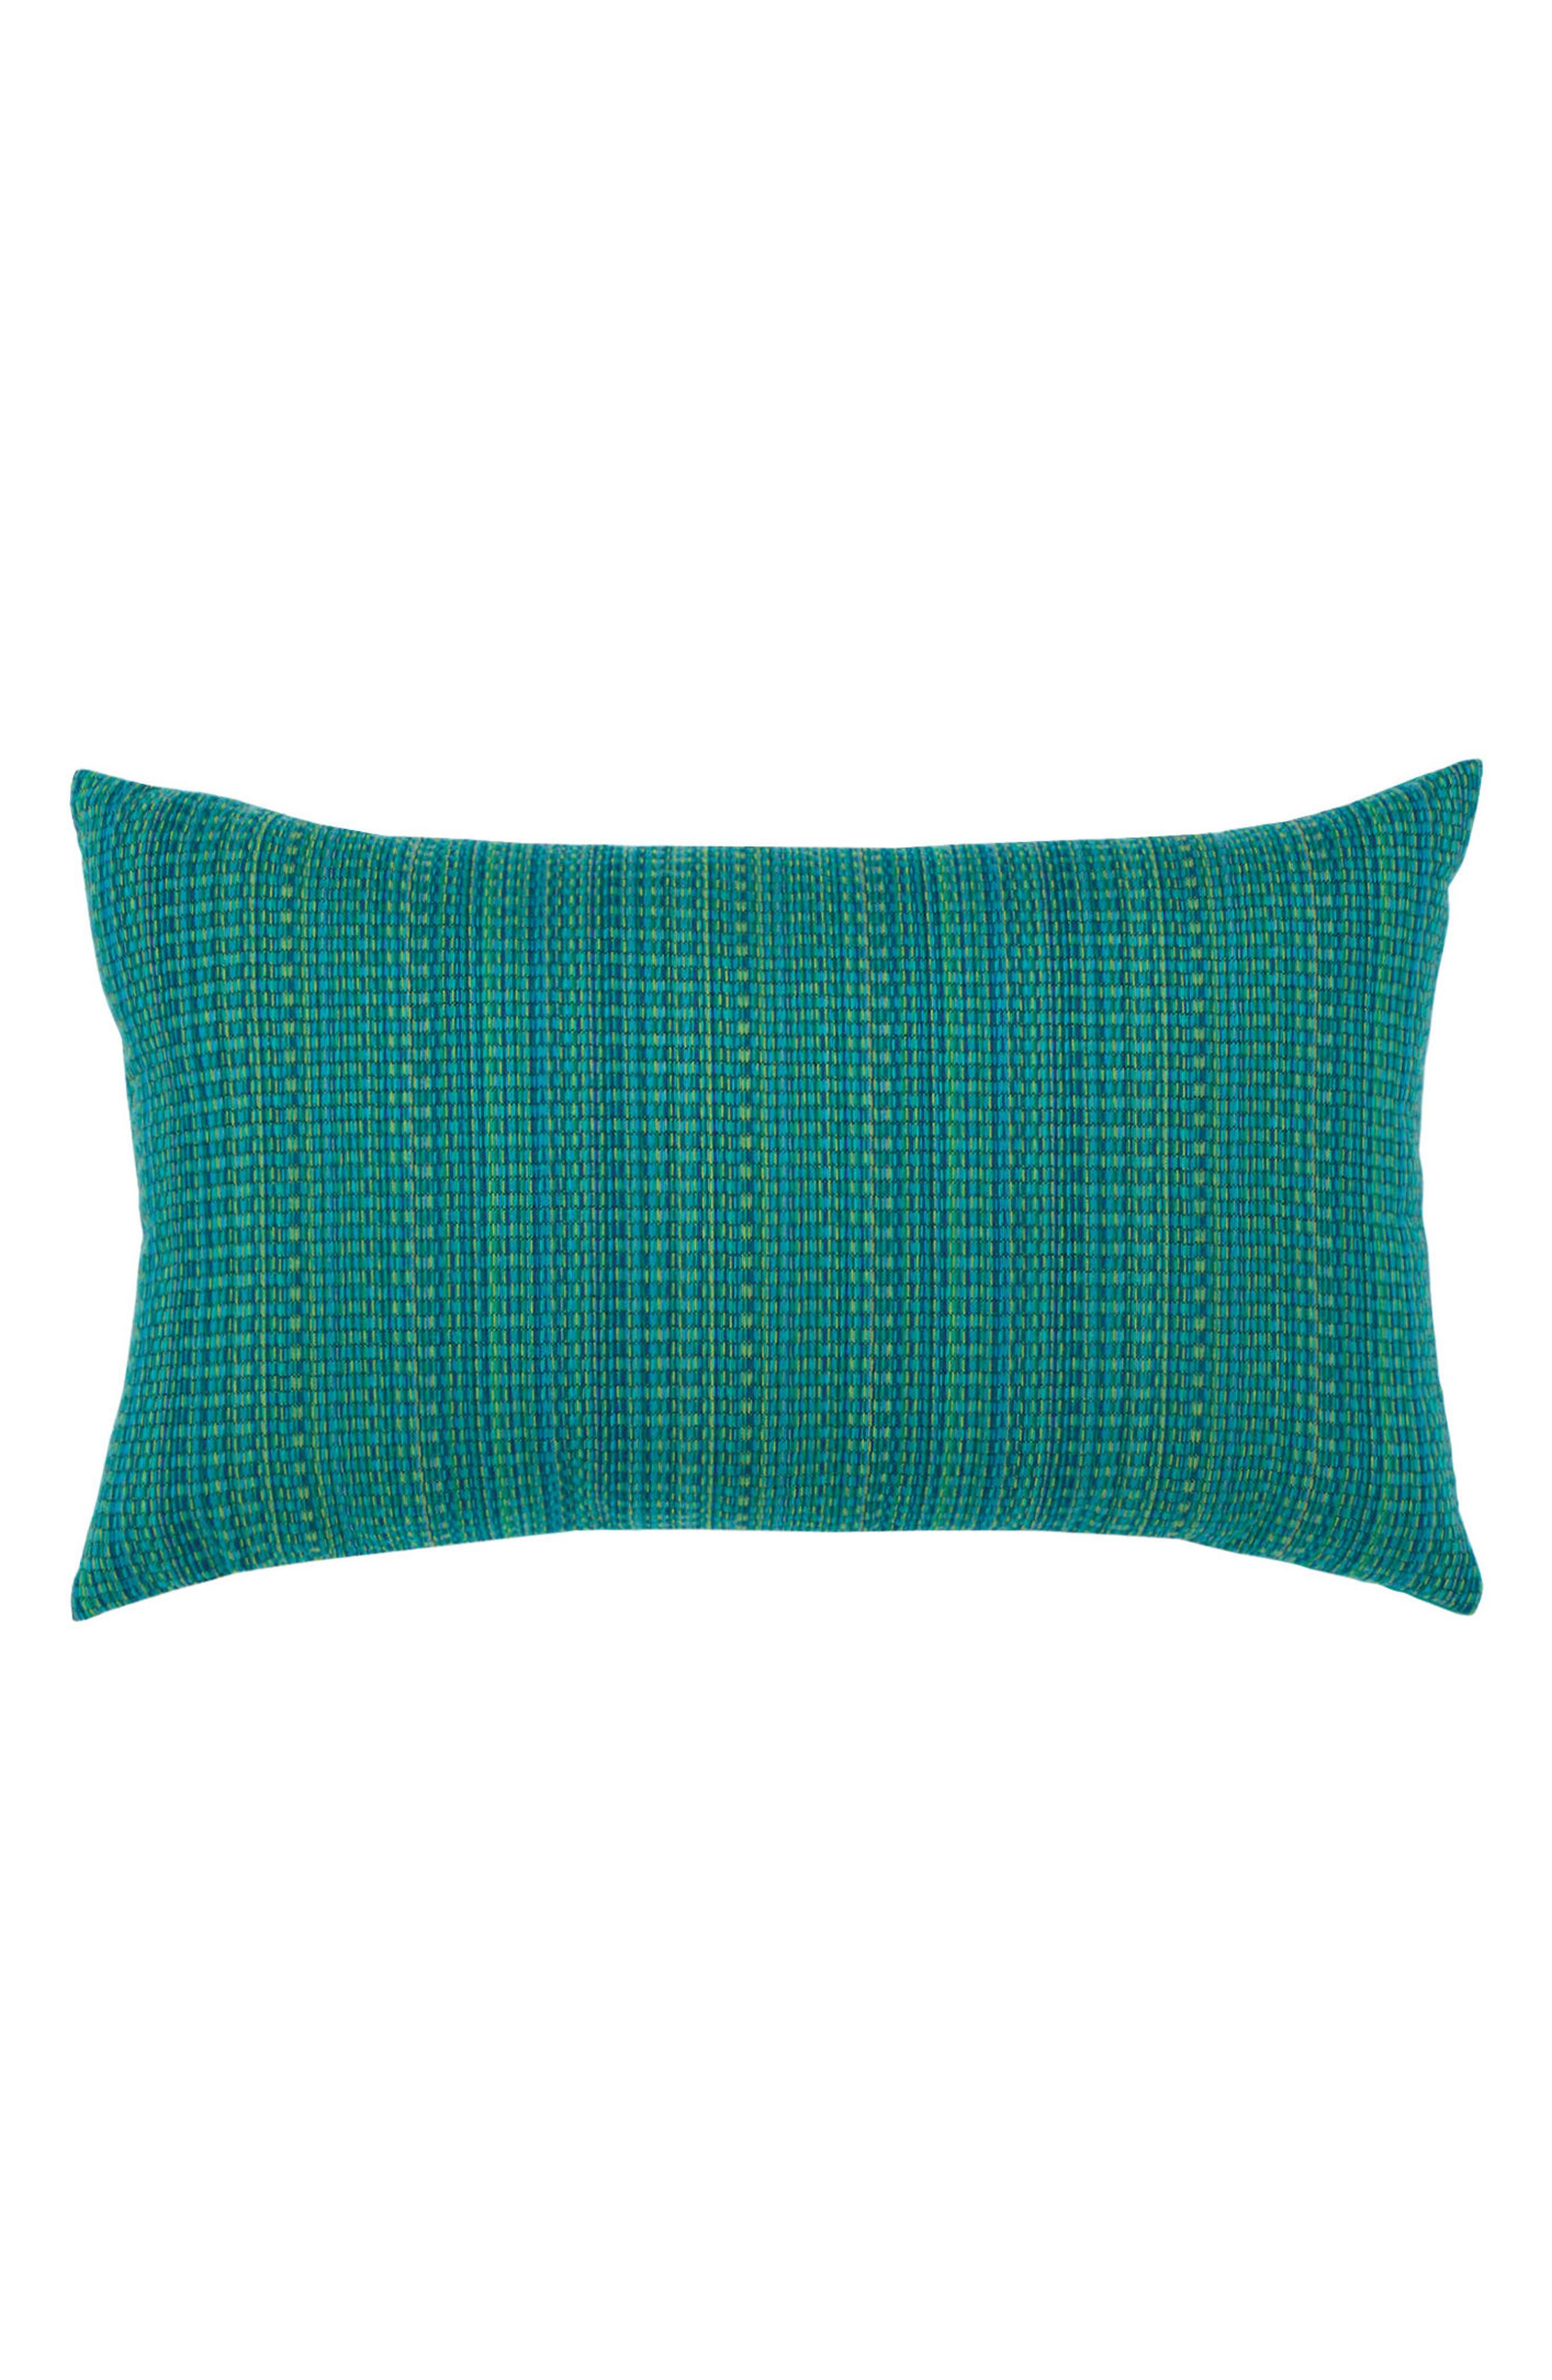 Eden Texture Indoor/Outdoor Accent Pillow,                         Main,                         color, Blue Green